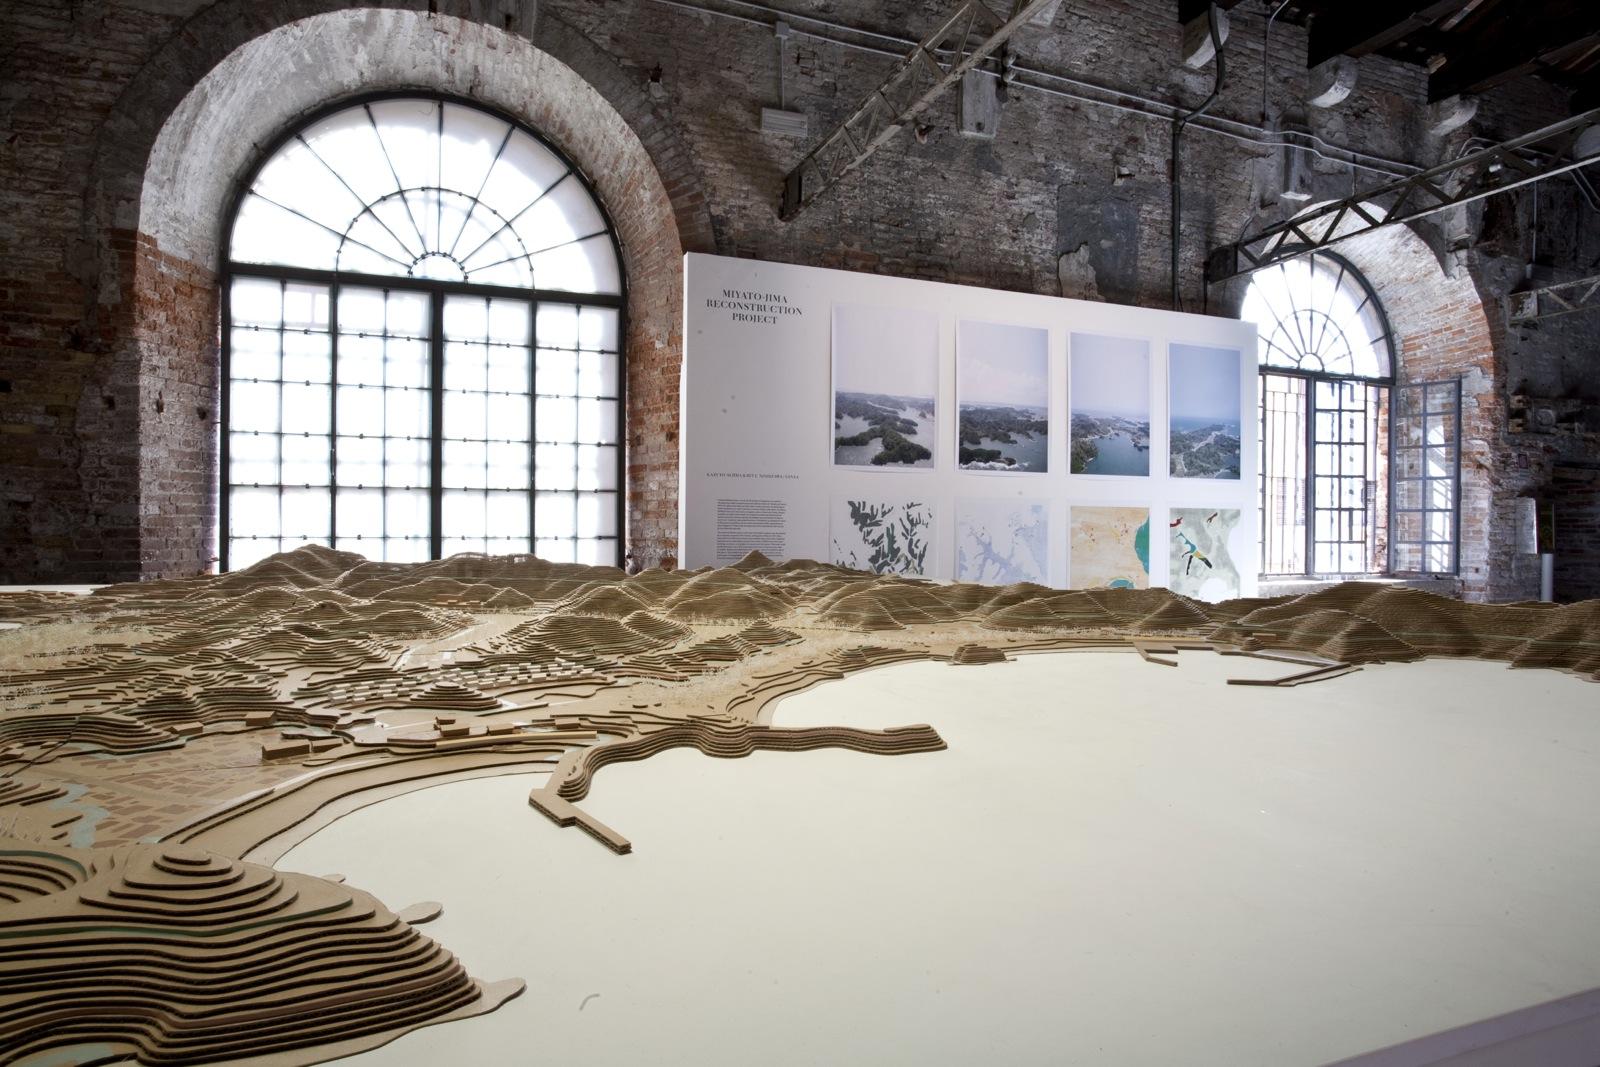 "Contribución a la Bienal de Venecia 2012. ""Miyato-jima reconstruction project"" por Kazuyo Sejima + Ryue Nishizawa/ Sanaa"